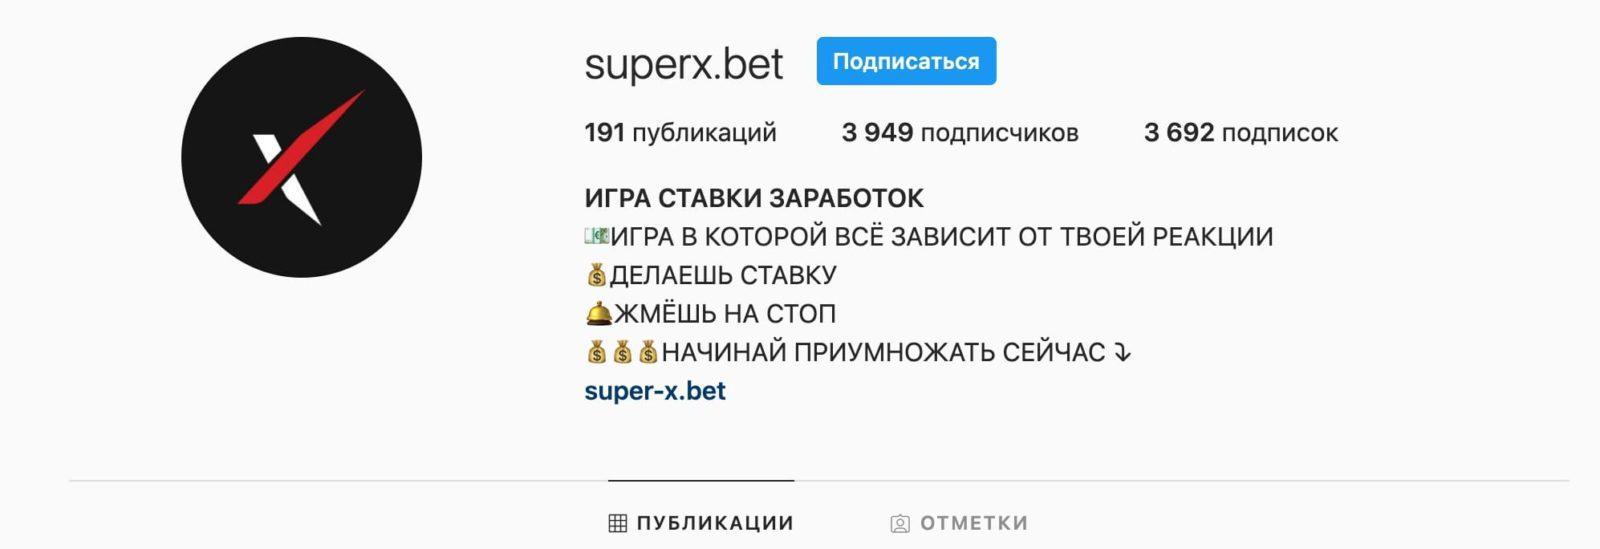 Инстаграм аккаунт Super-x.bet (Супер Икс Бет)